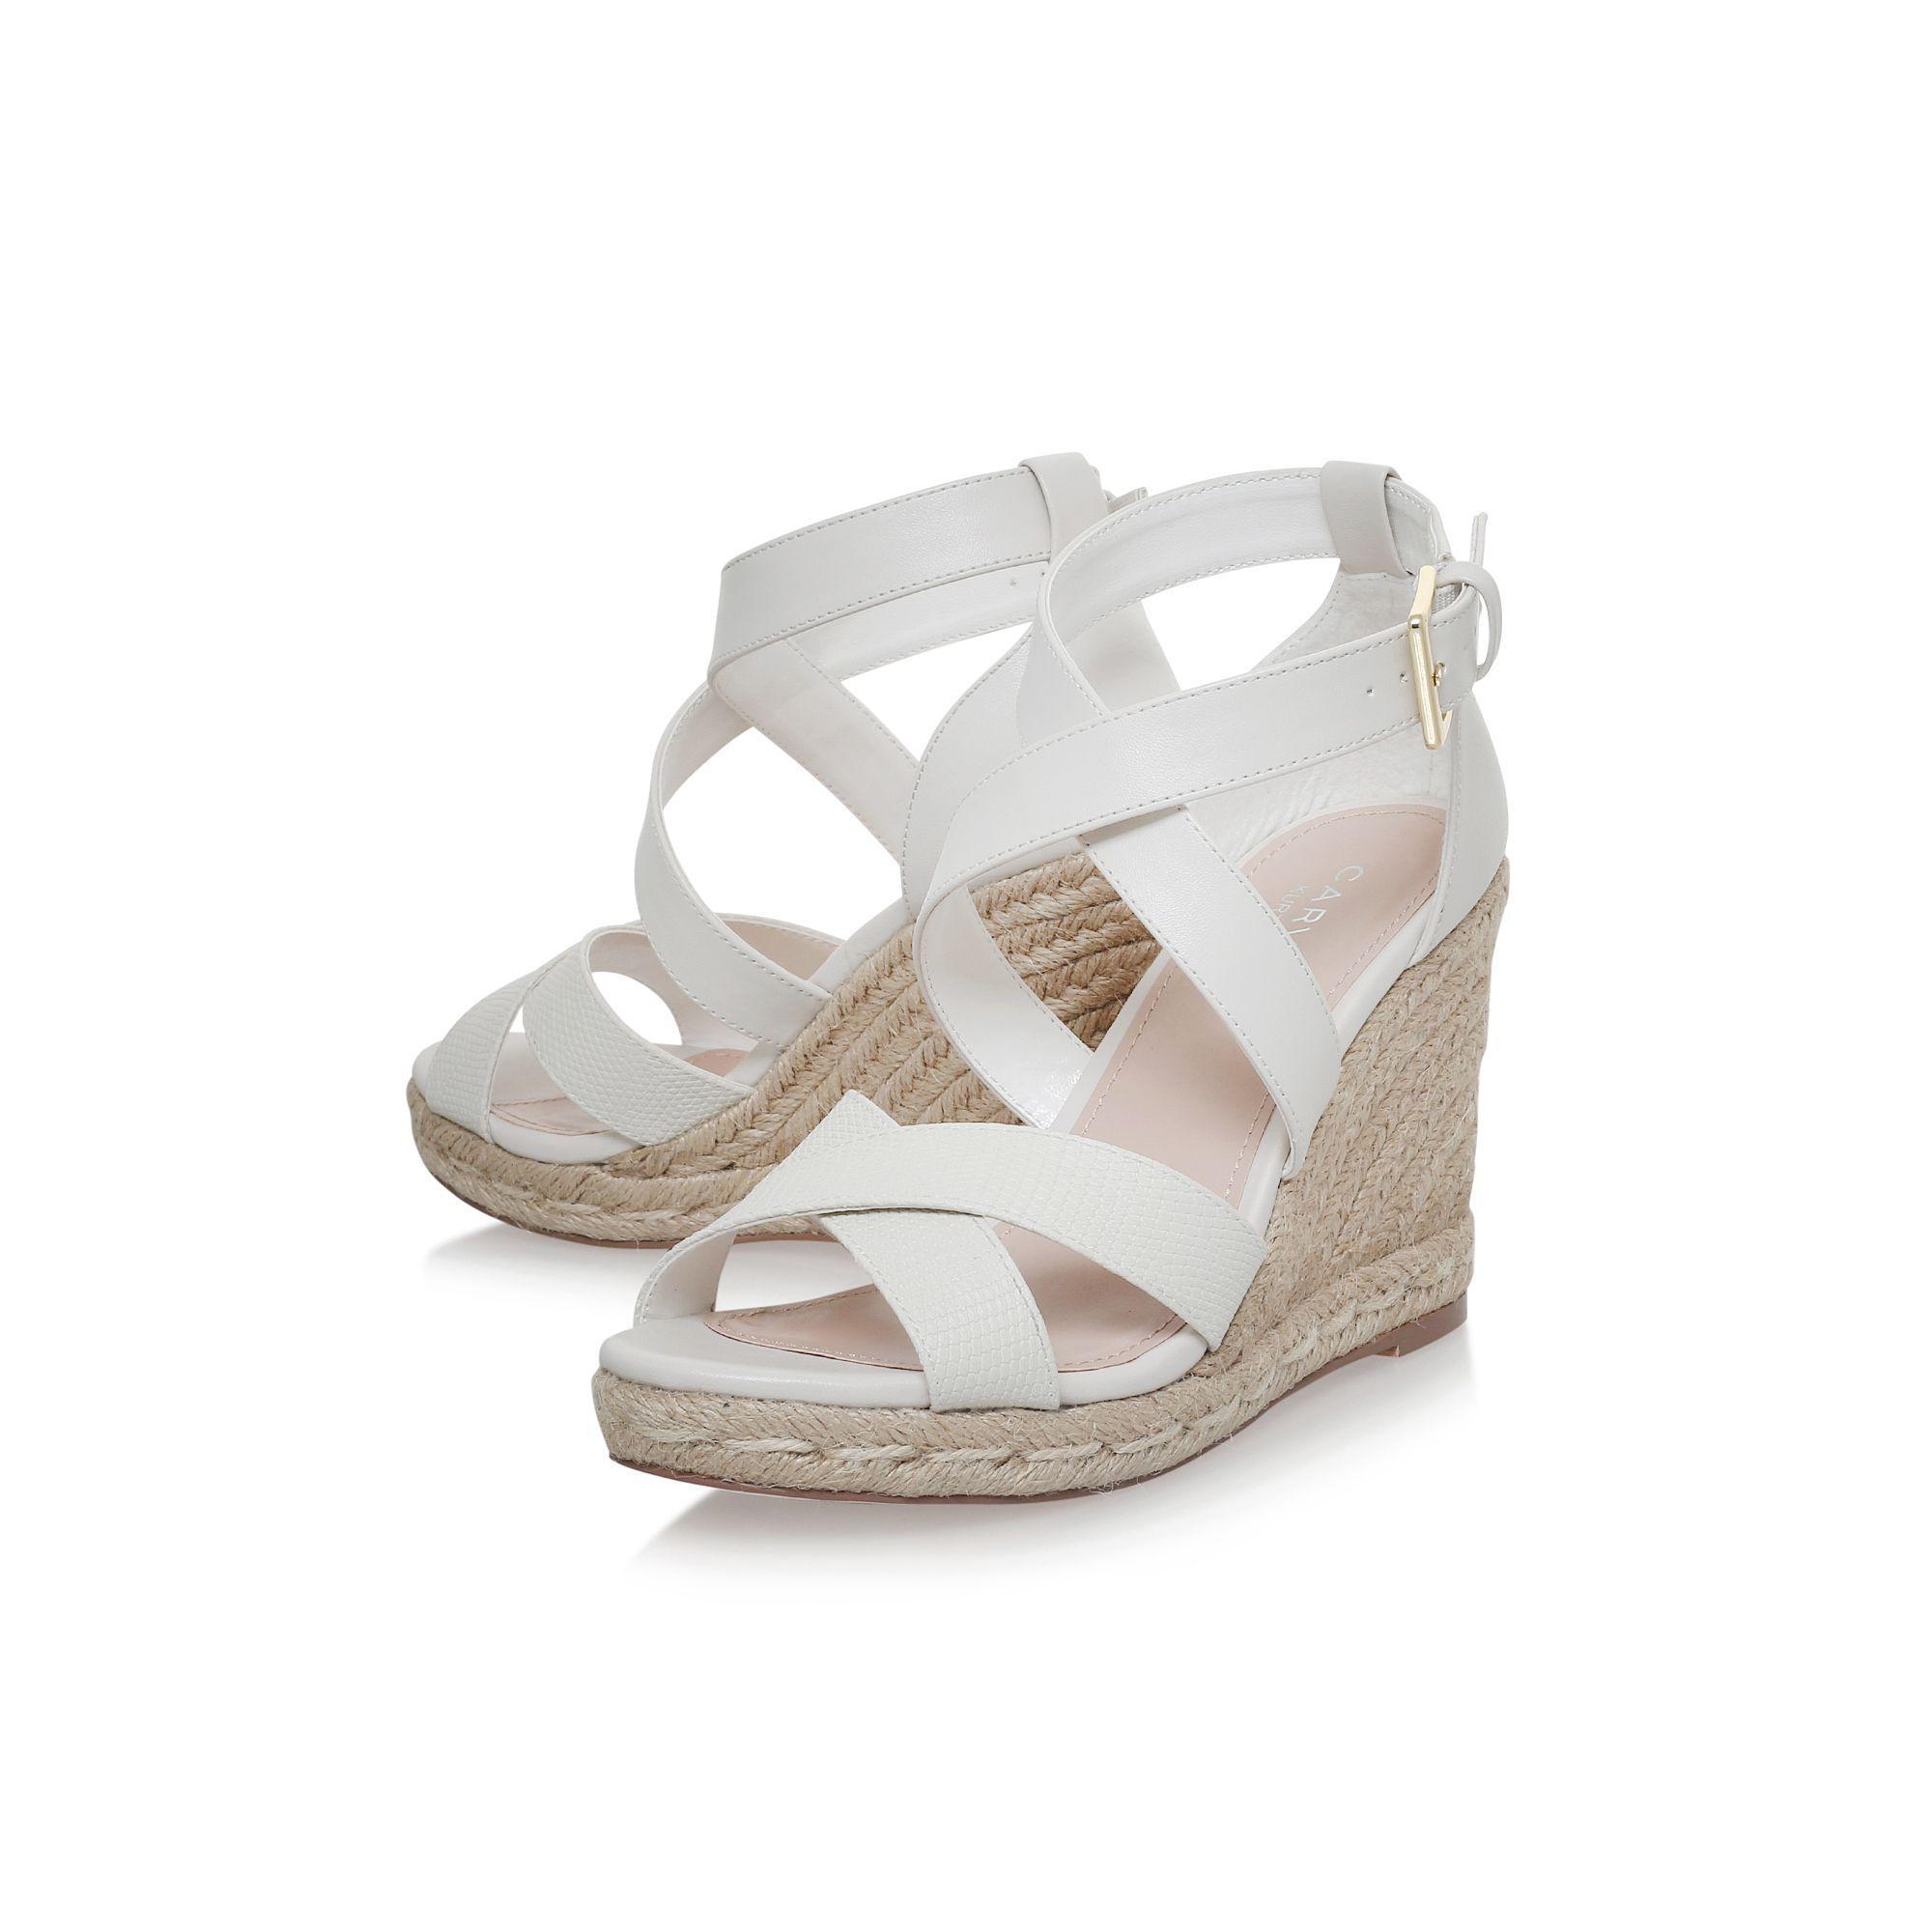 b0c10faaa4 Carvela Kurt Geiger - White Smashing High Heel Wedge Sandals - Lyst. View  fullscreen